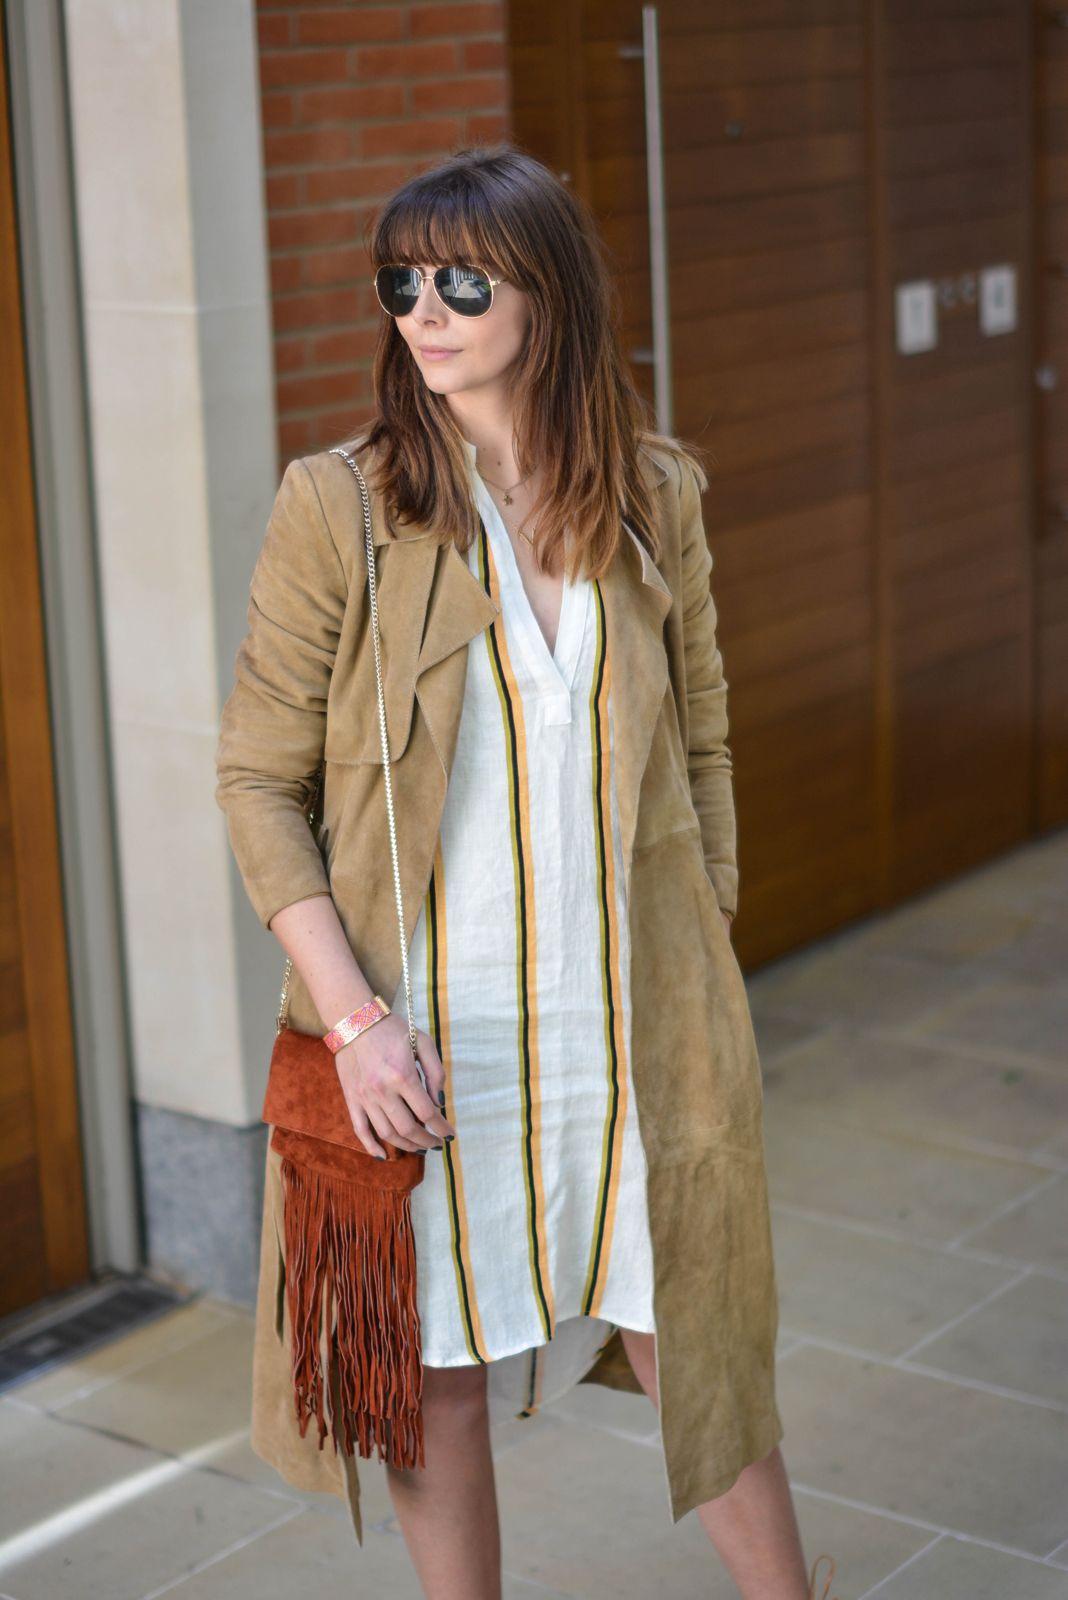 dbd3b2d172a EJSTYLE - Emma Hill wears H&M linen stripe shirt dress, Gestuz suede trench  coat, gold aviator sunglasses, Karen Millen suded fringe bag, ...